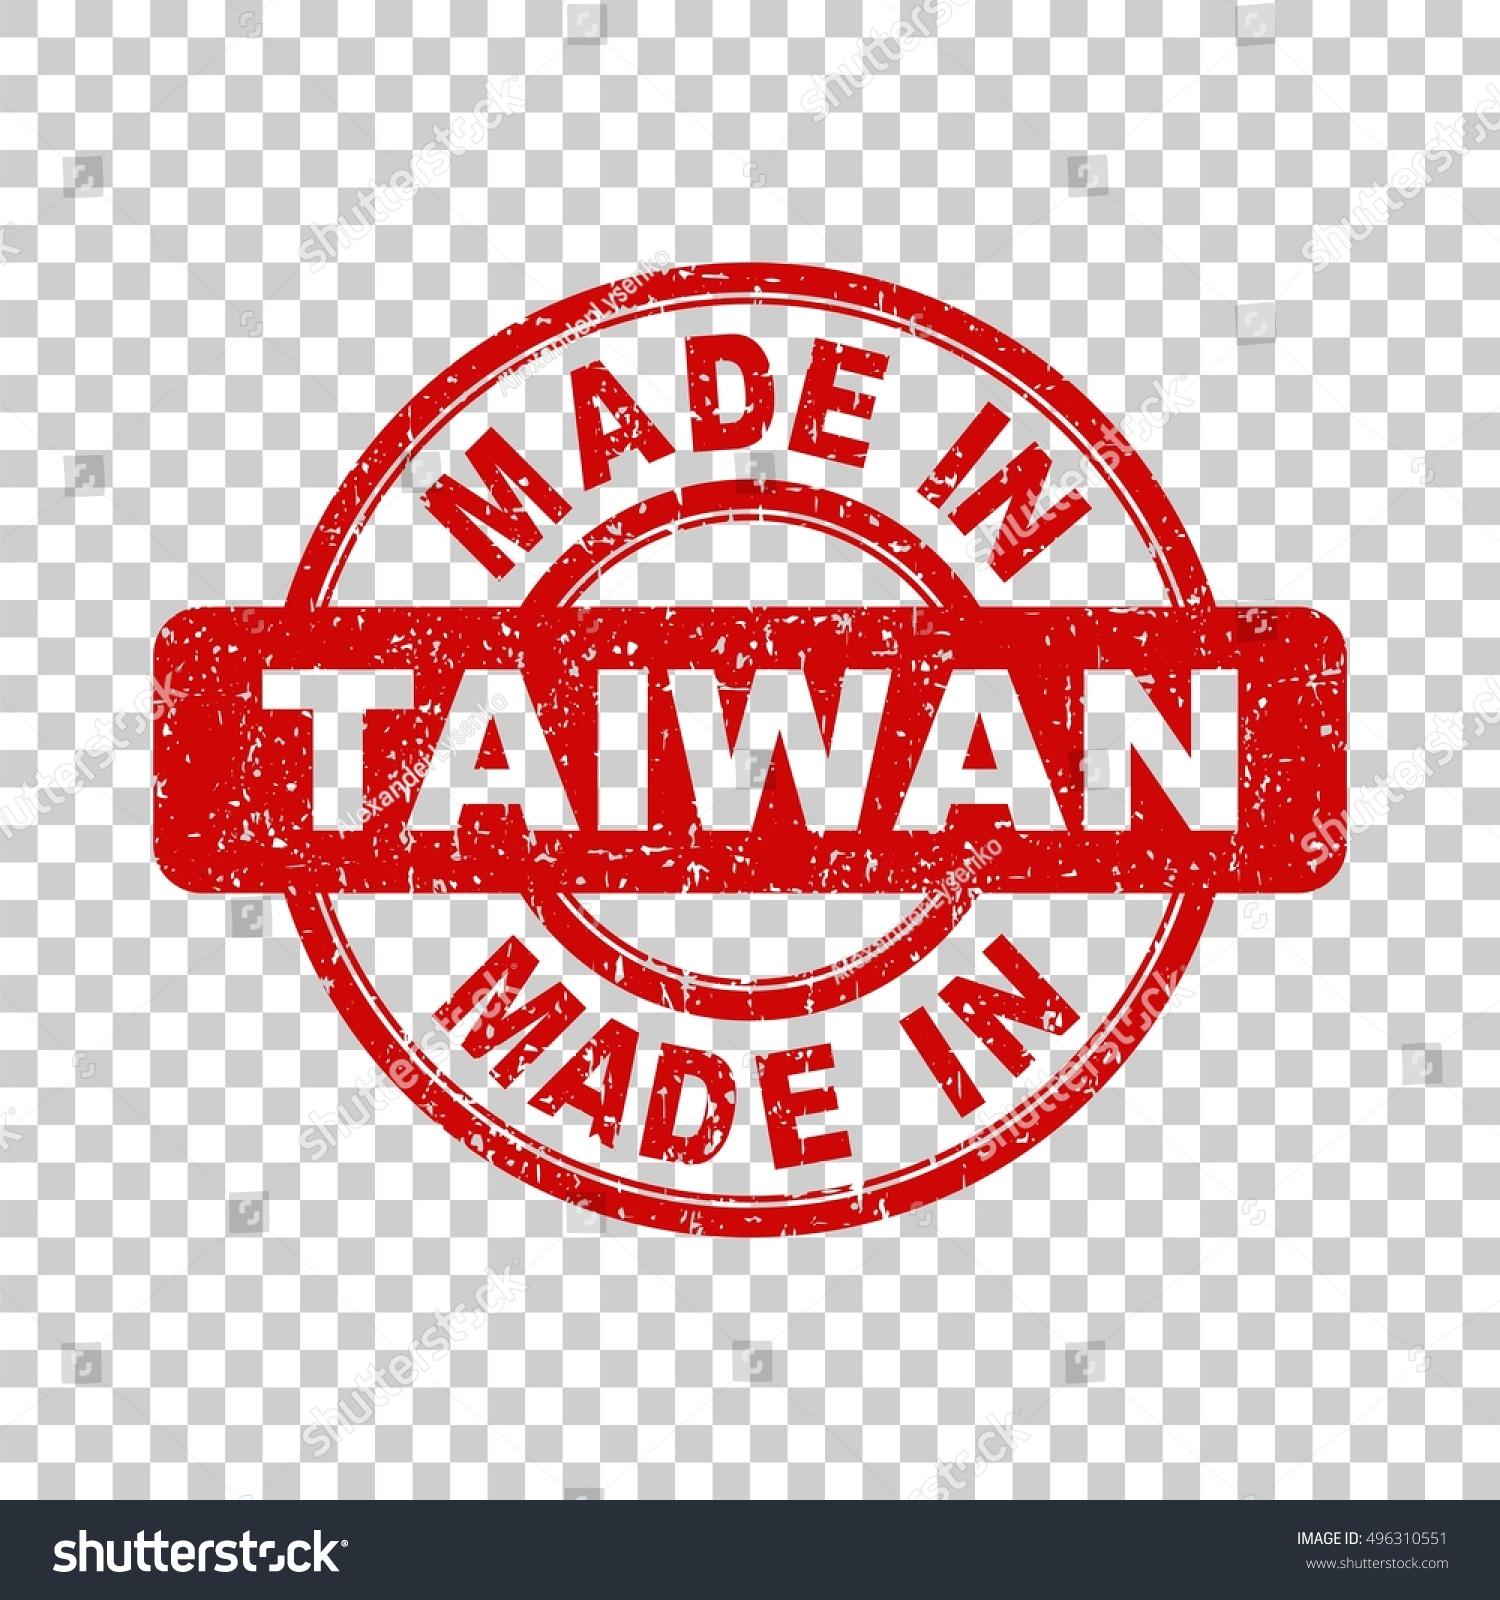 made taiwan red stamp vector illustration stock vector 496310551 shutterstock. Black Bedroom Furniture Sets. Home Design Ideas